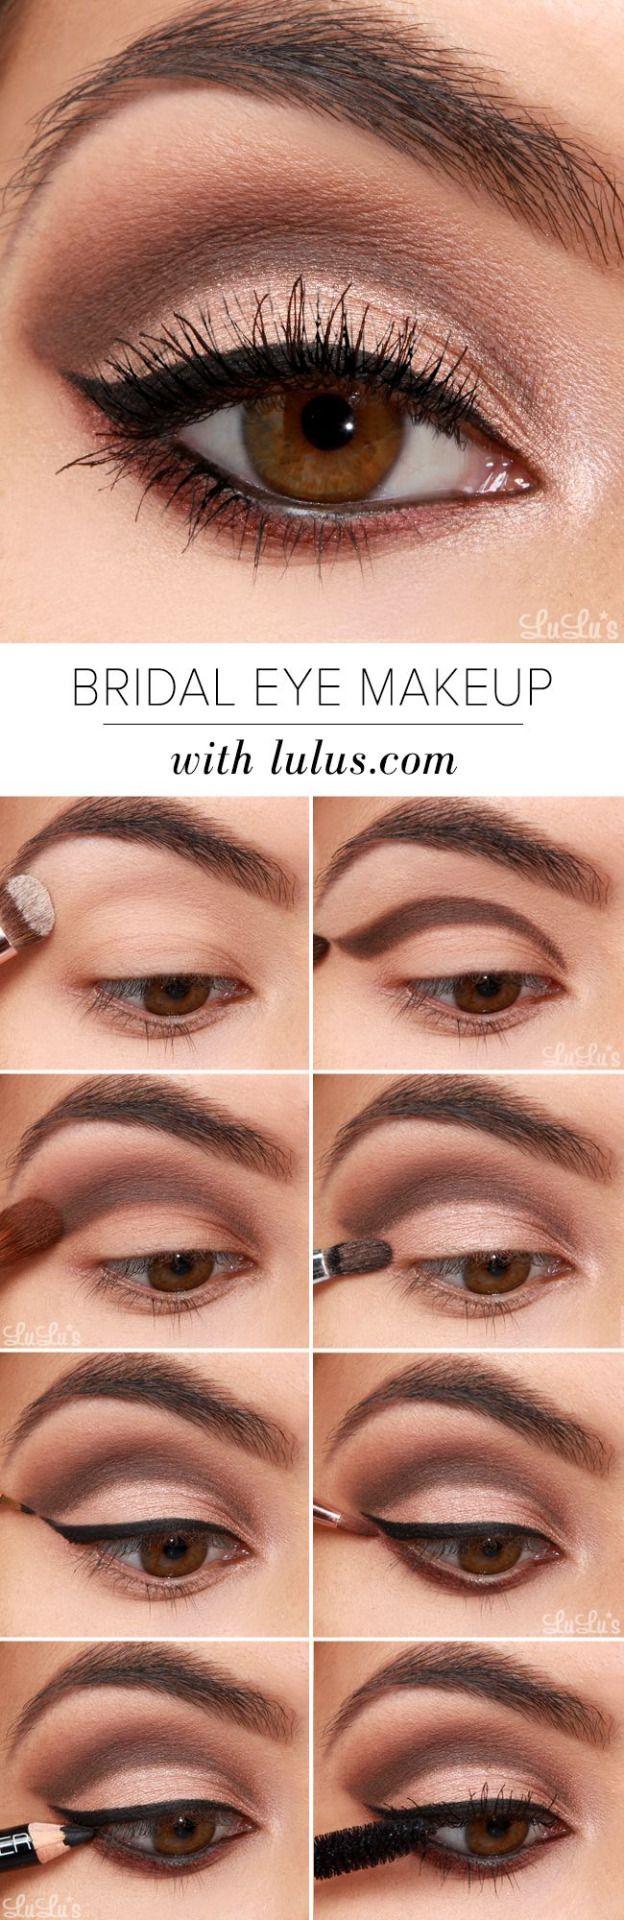 Makeup Fans We Heart It How To Bridal Eye Makeup Tutorial Make